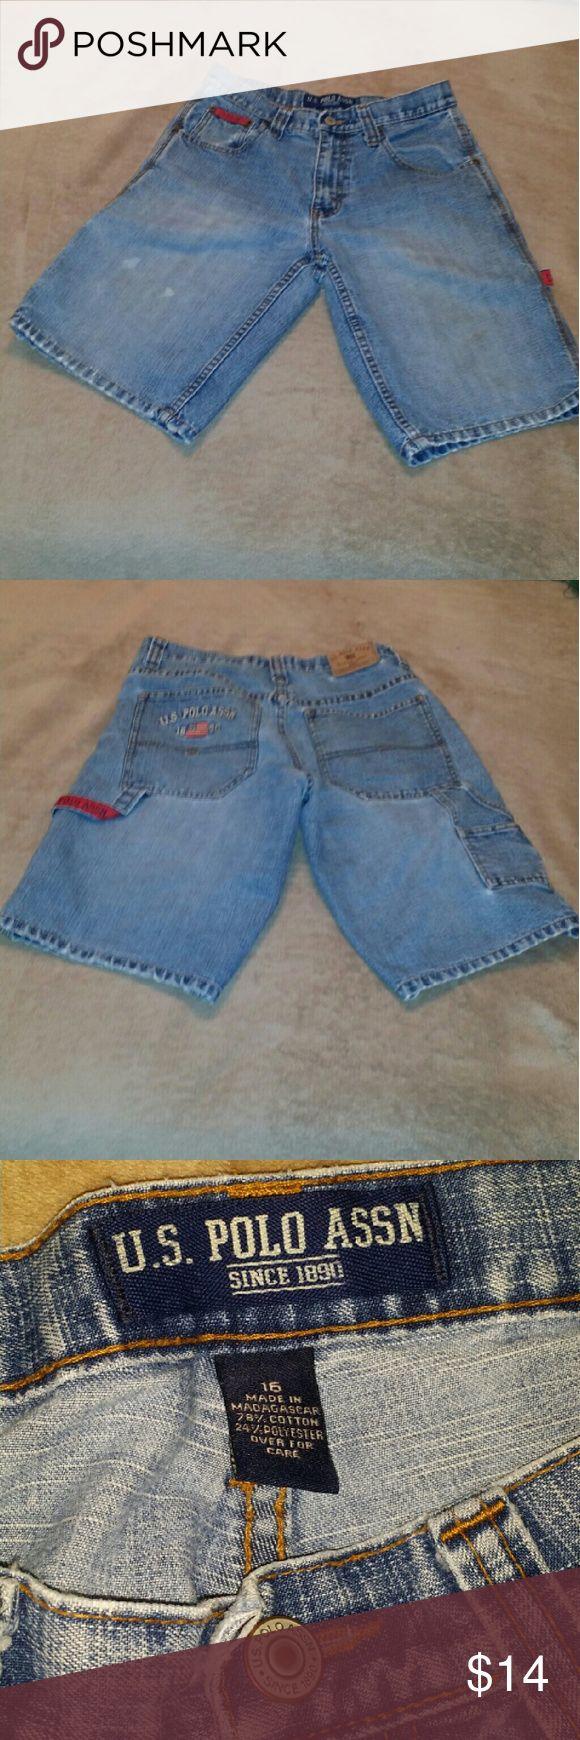 "U.S. Polo Association Jean Shorts U.S. Polo Association Jean medium blue Cargo Shorts.   78% Cotton  24% Polyester  10"" Inseam U.S. Polo Assn. Bottoms Shorts"